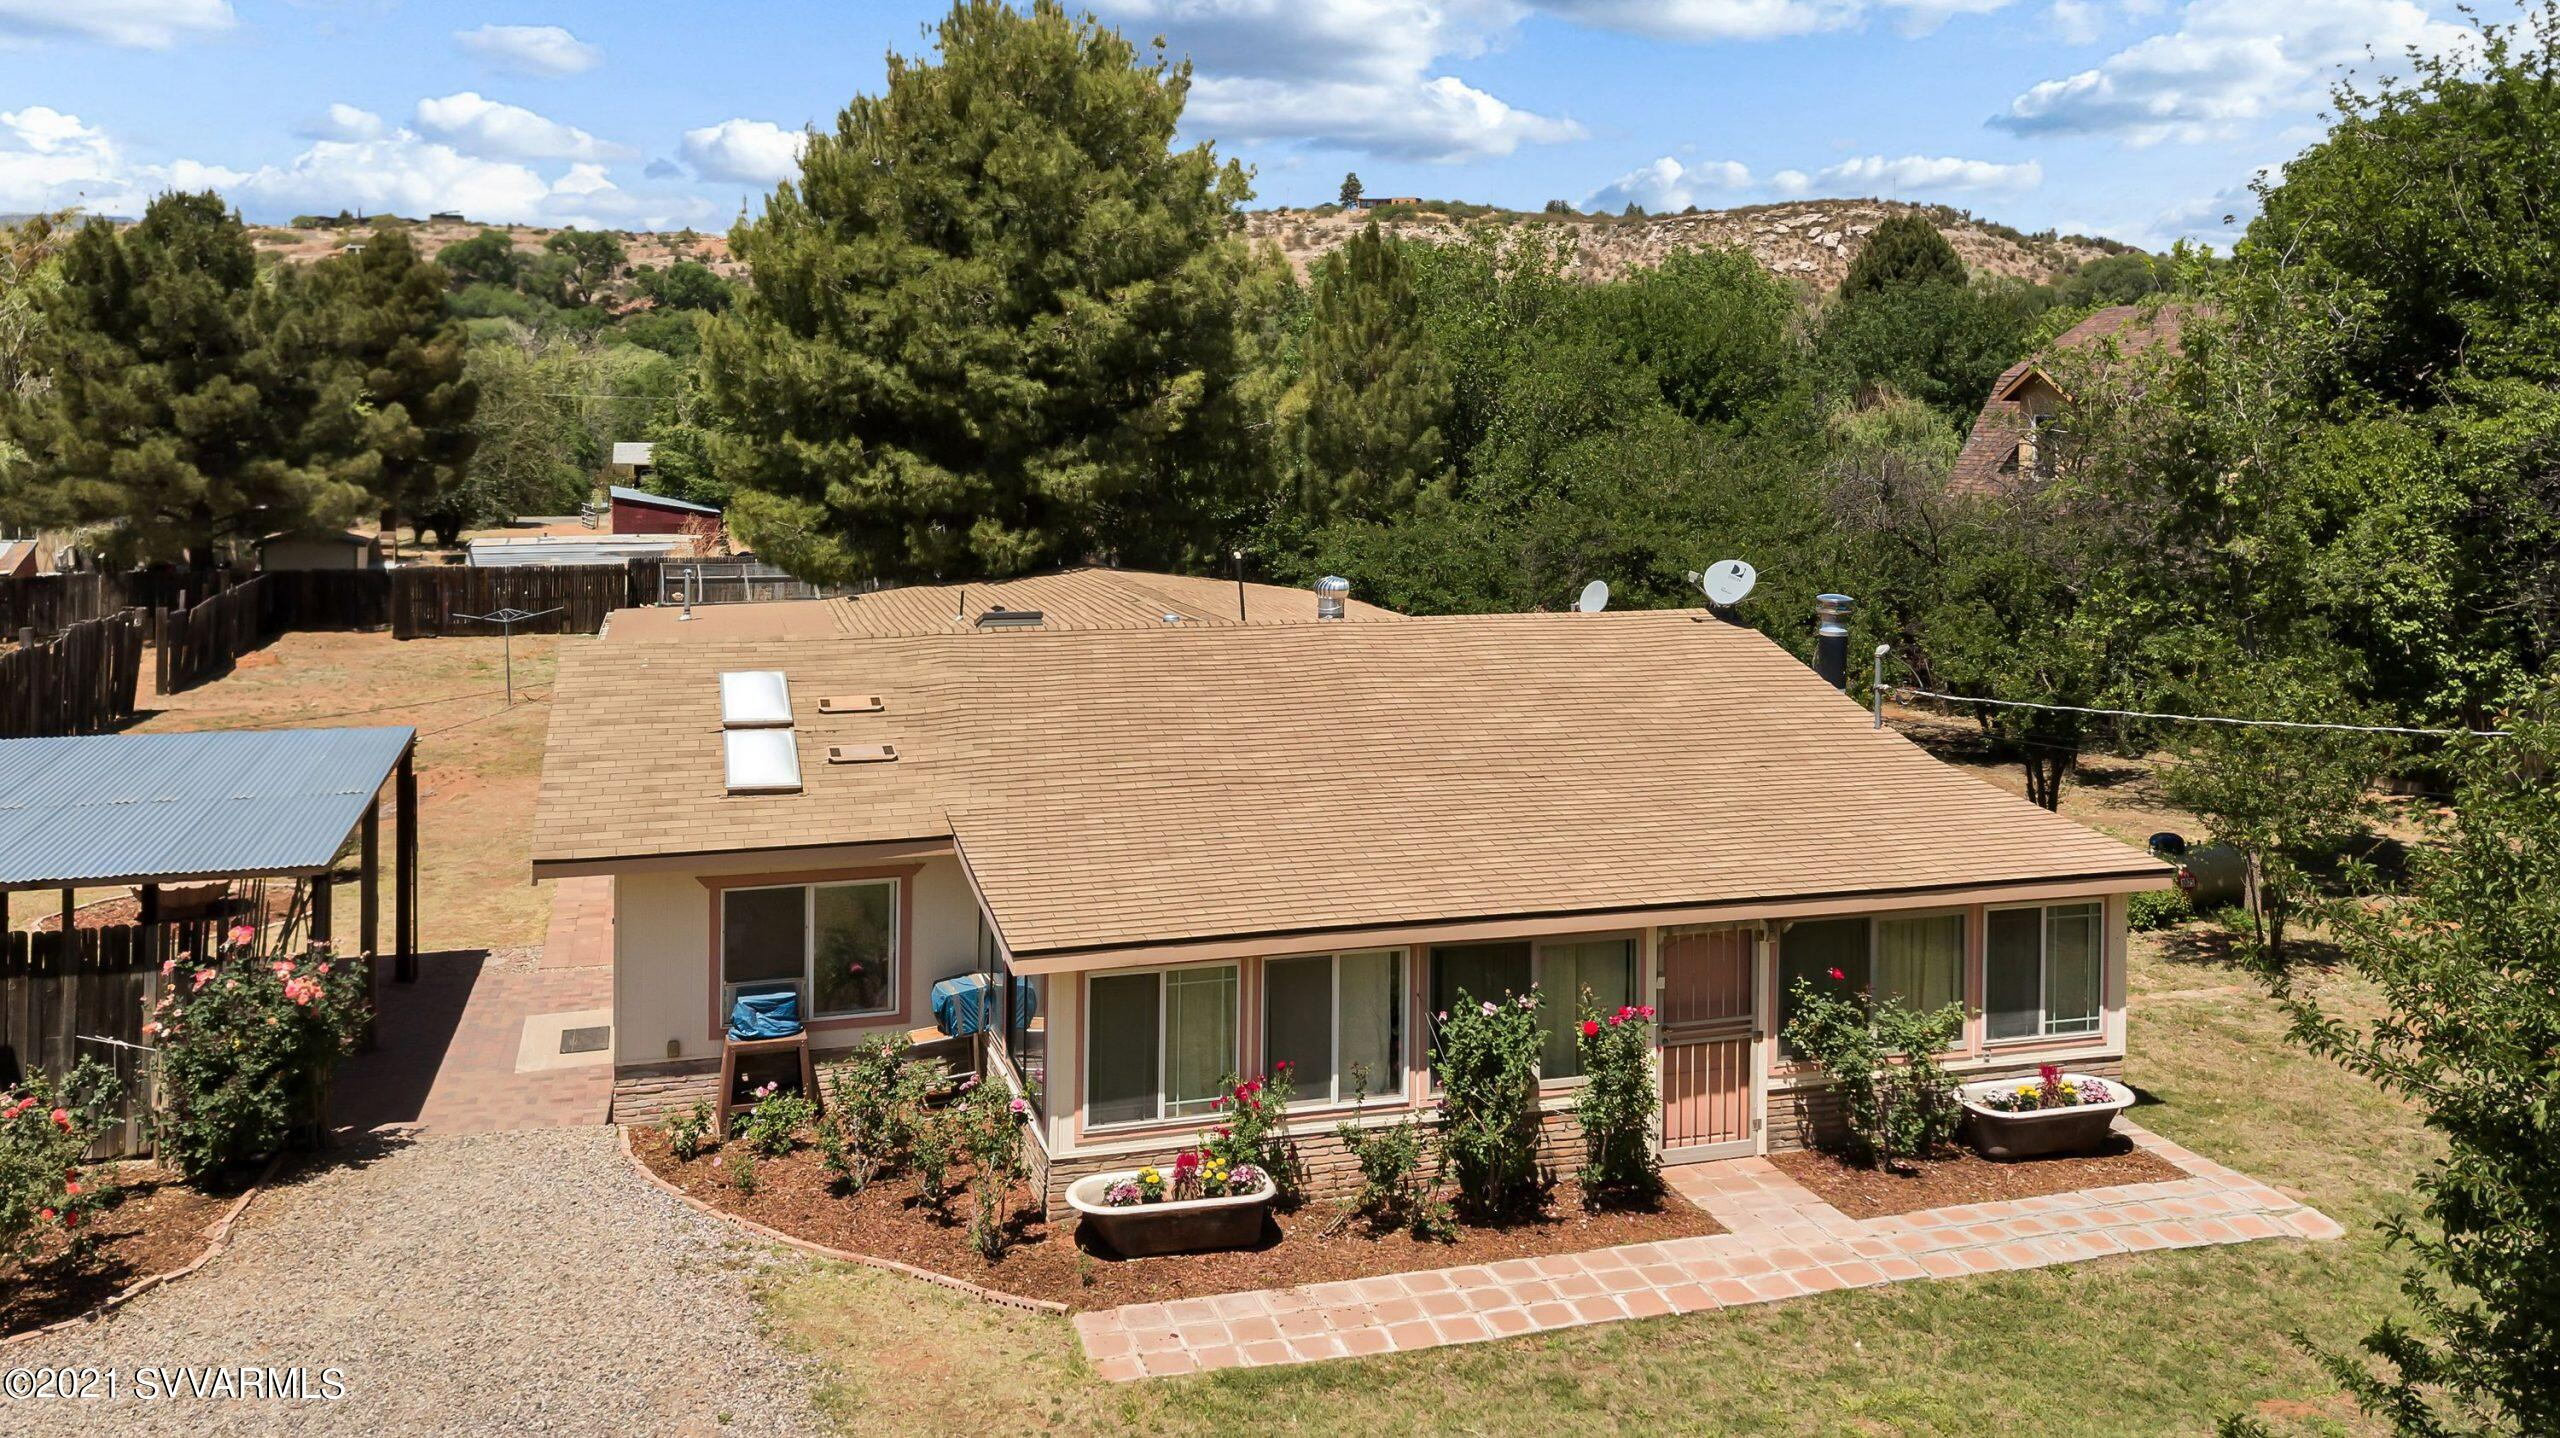 130 N Farm Circle Rd Cornville, AZ 86325